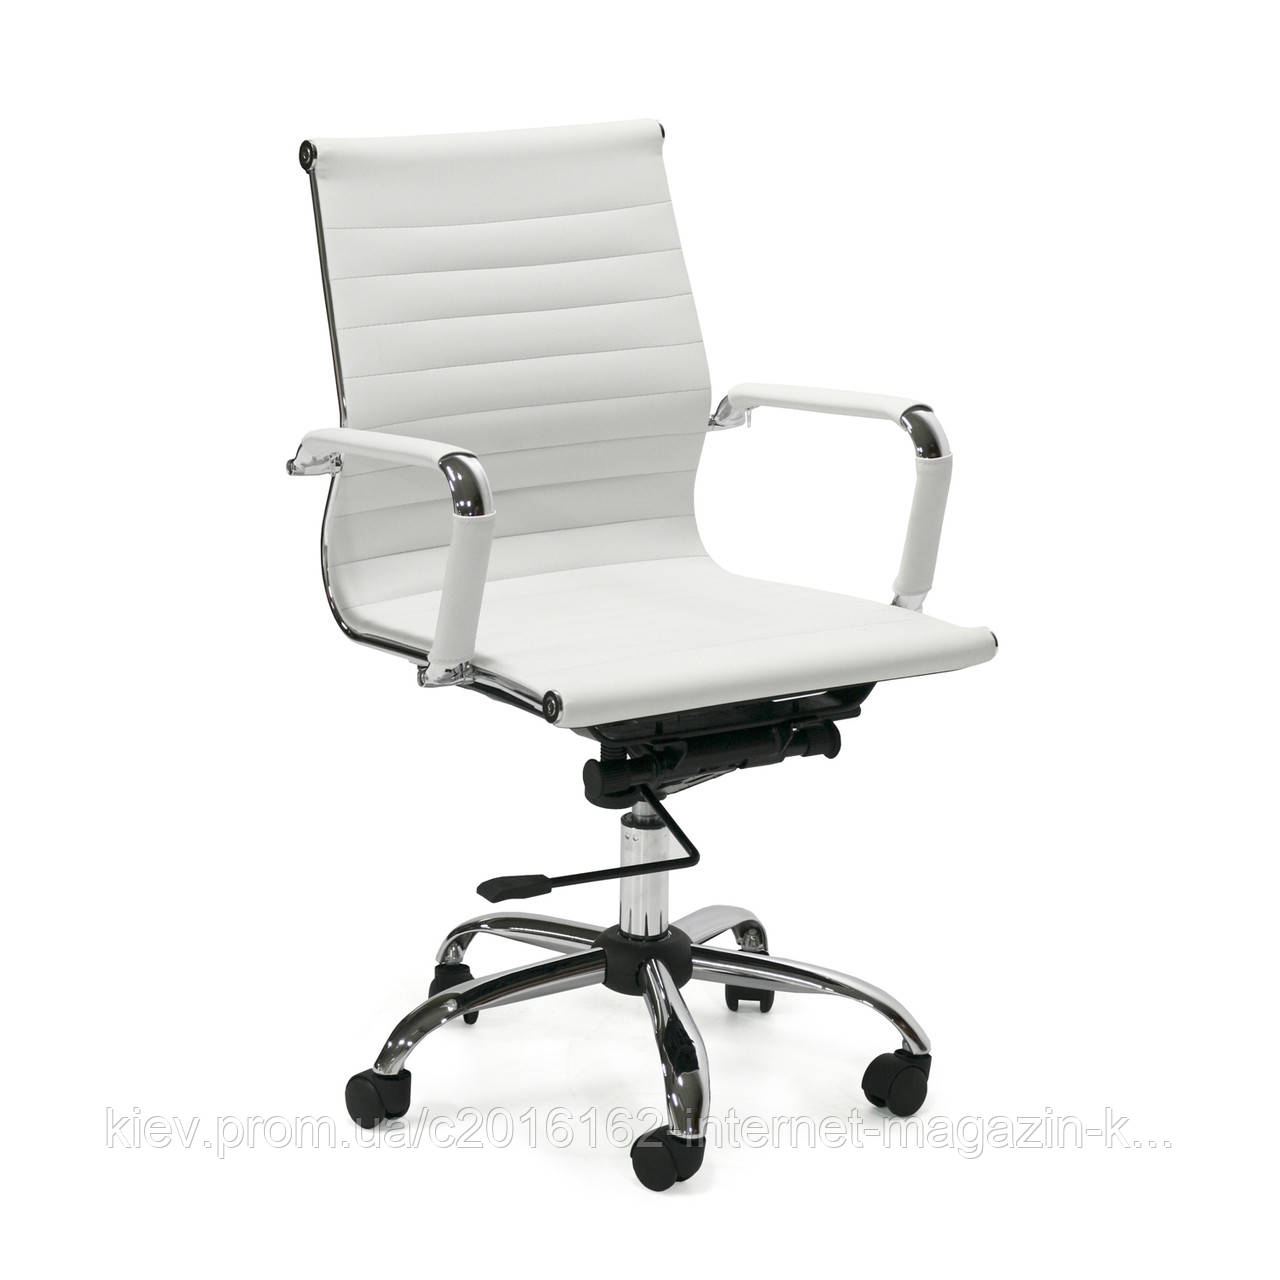 Кресло офисное ULTRA  ArtLeather  White/Chrome